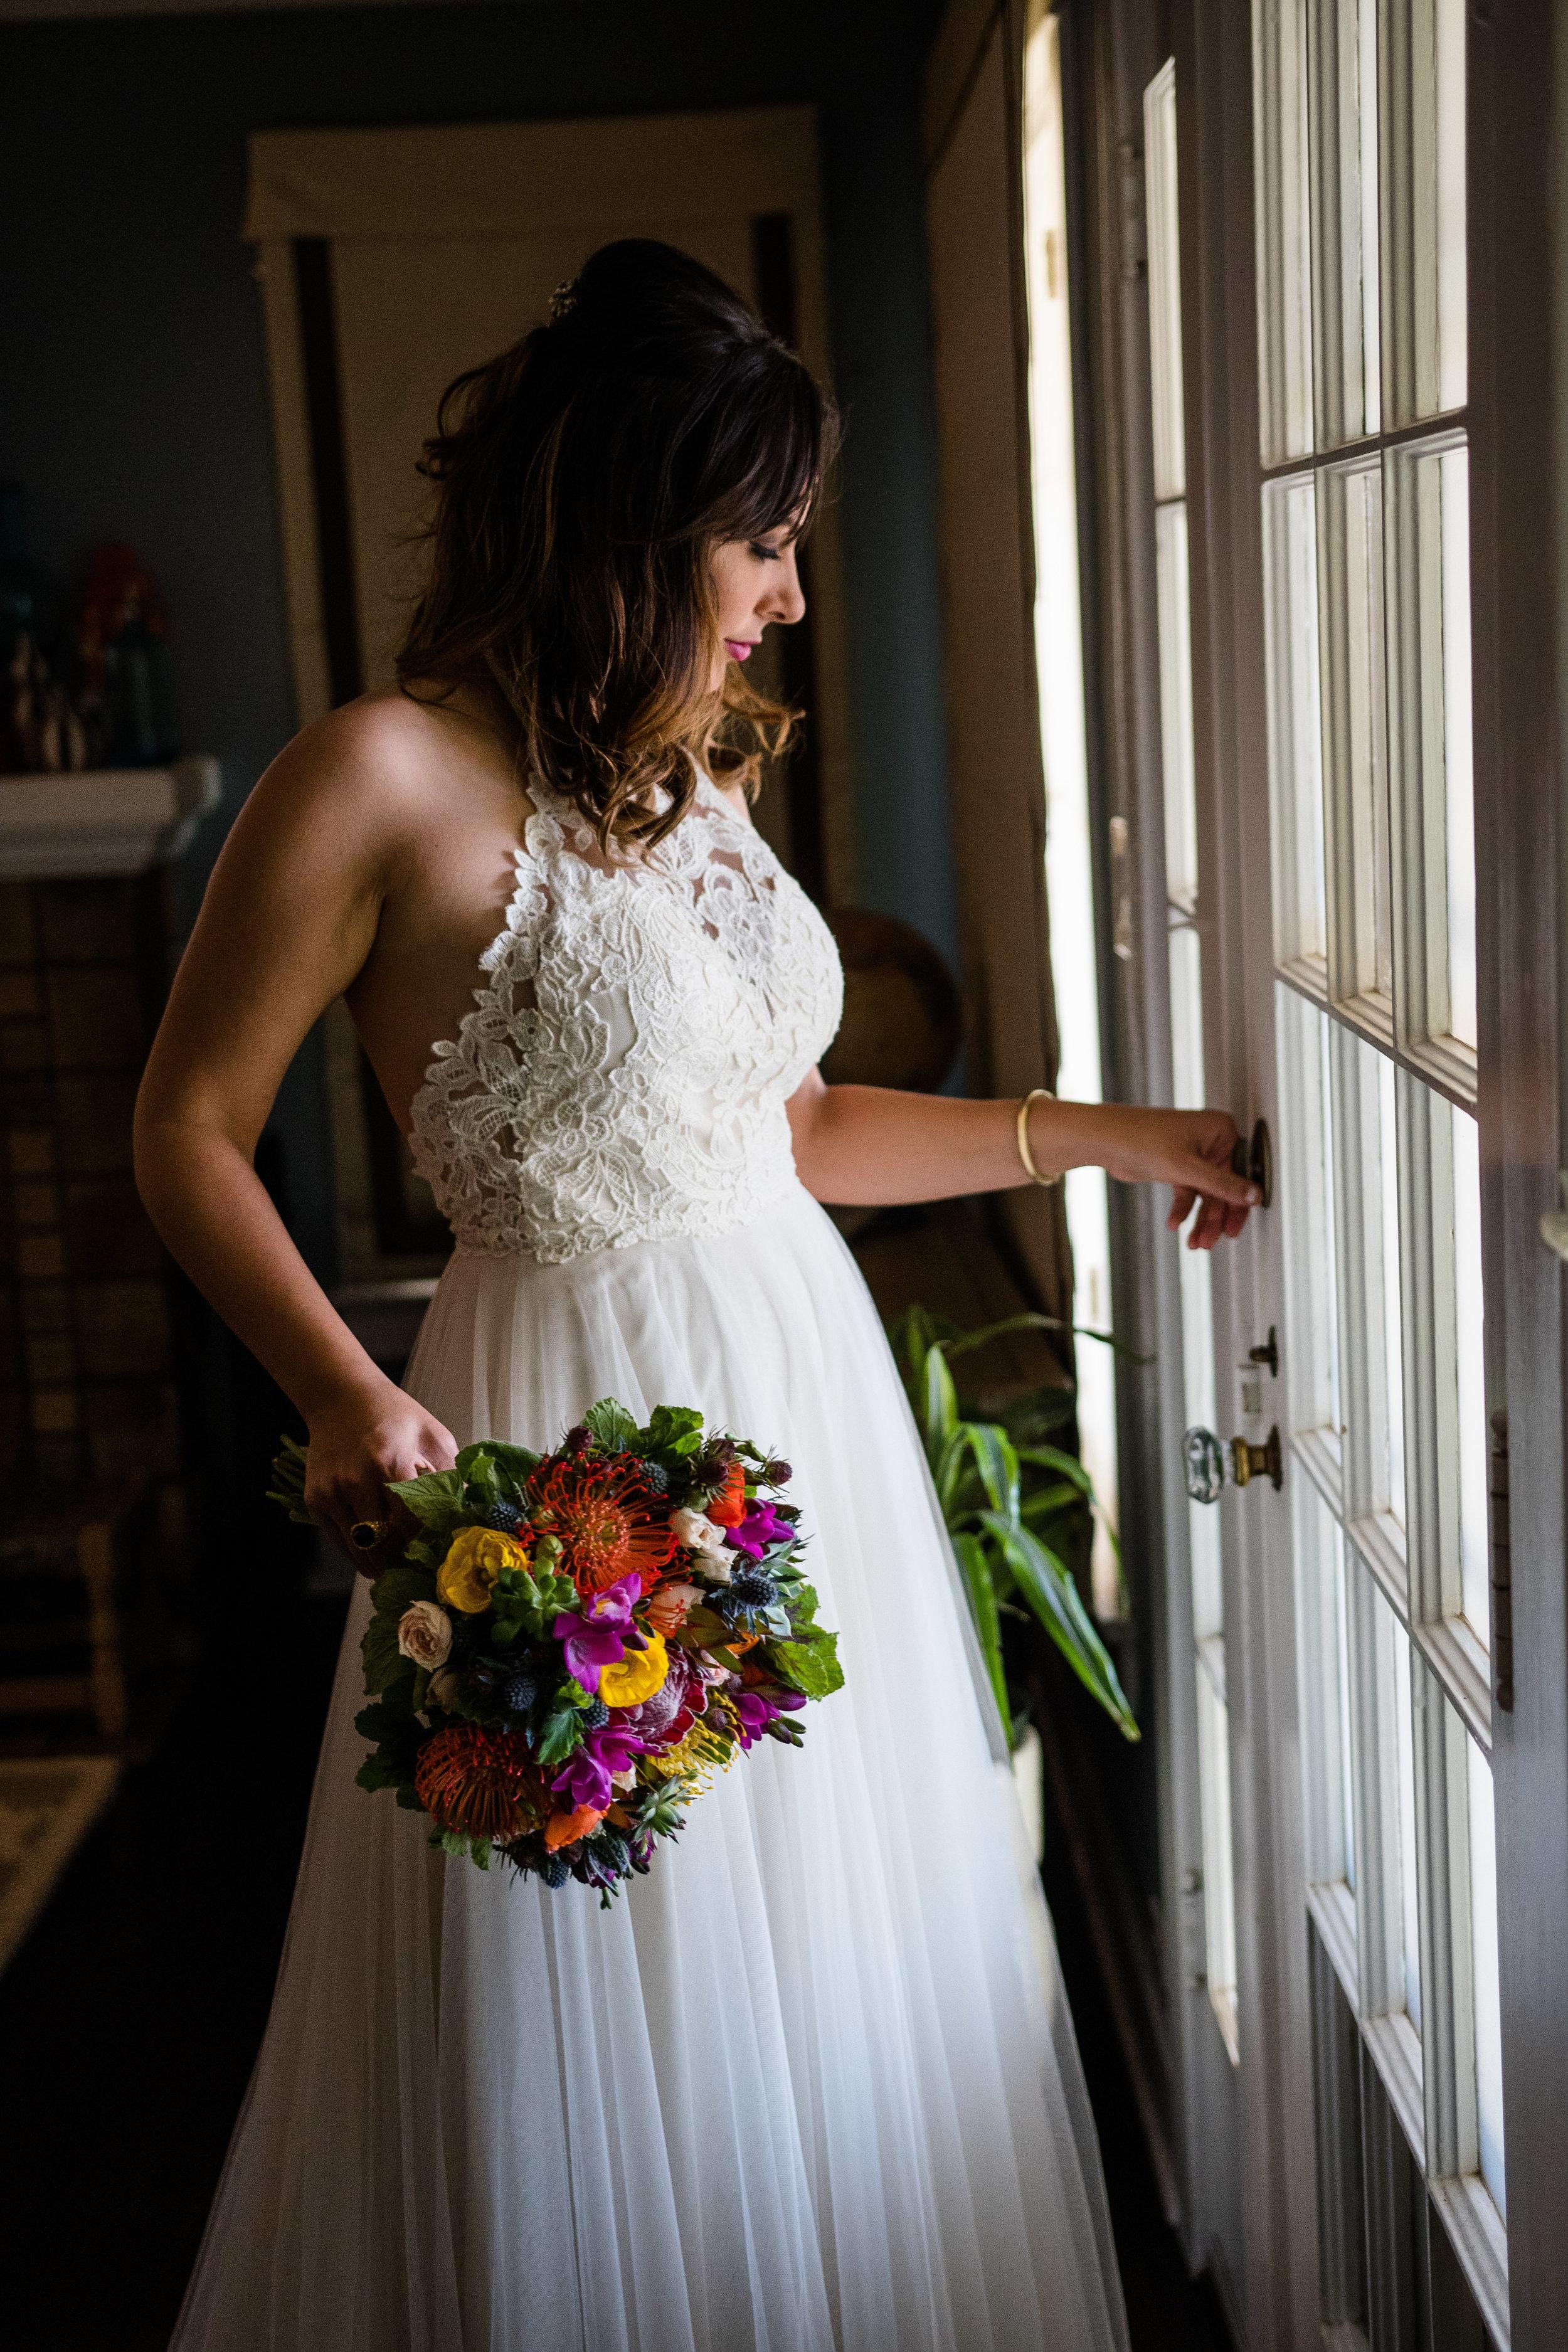 Vibrant Fiesta Backyard Wedding Reception bride getting ready to make her entrance.jpg